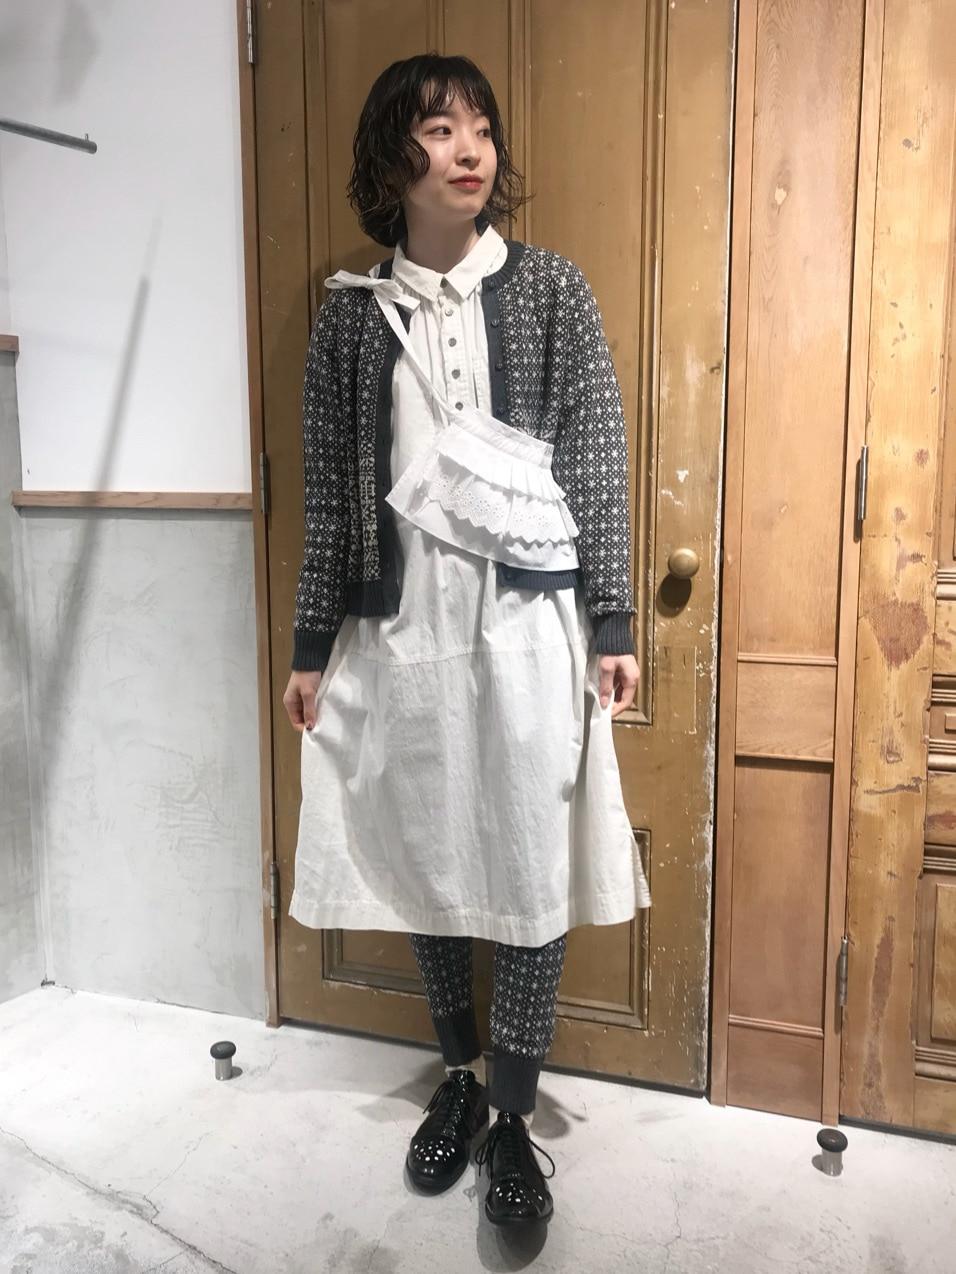 Malle chambre de charme ルミネ新宿 身長:164cm 2020.12.30